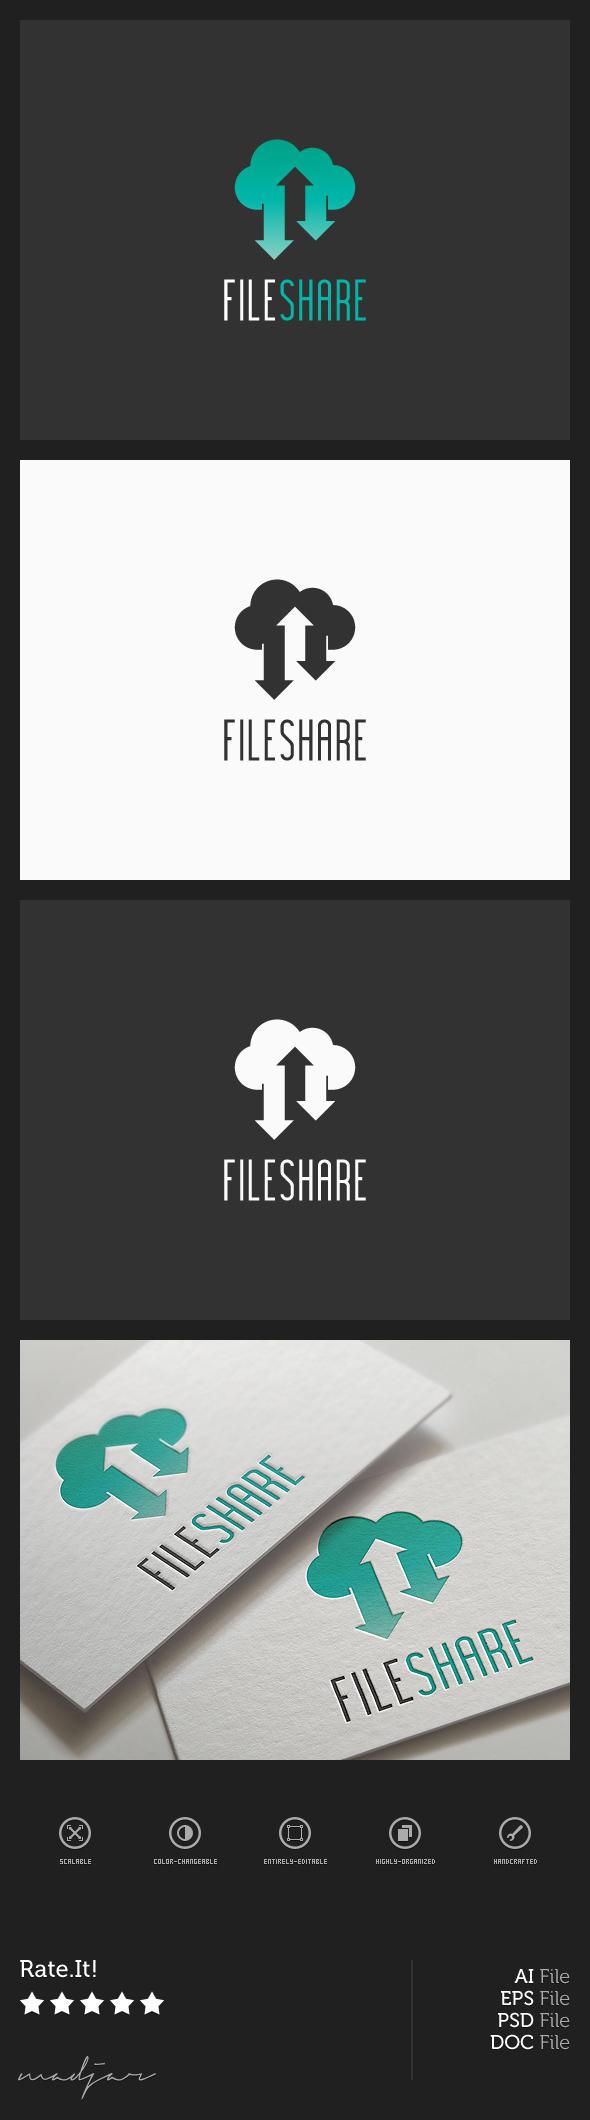 Cloud Share Logo by madjarov